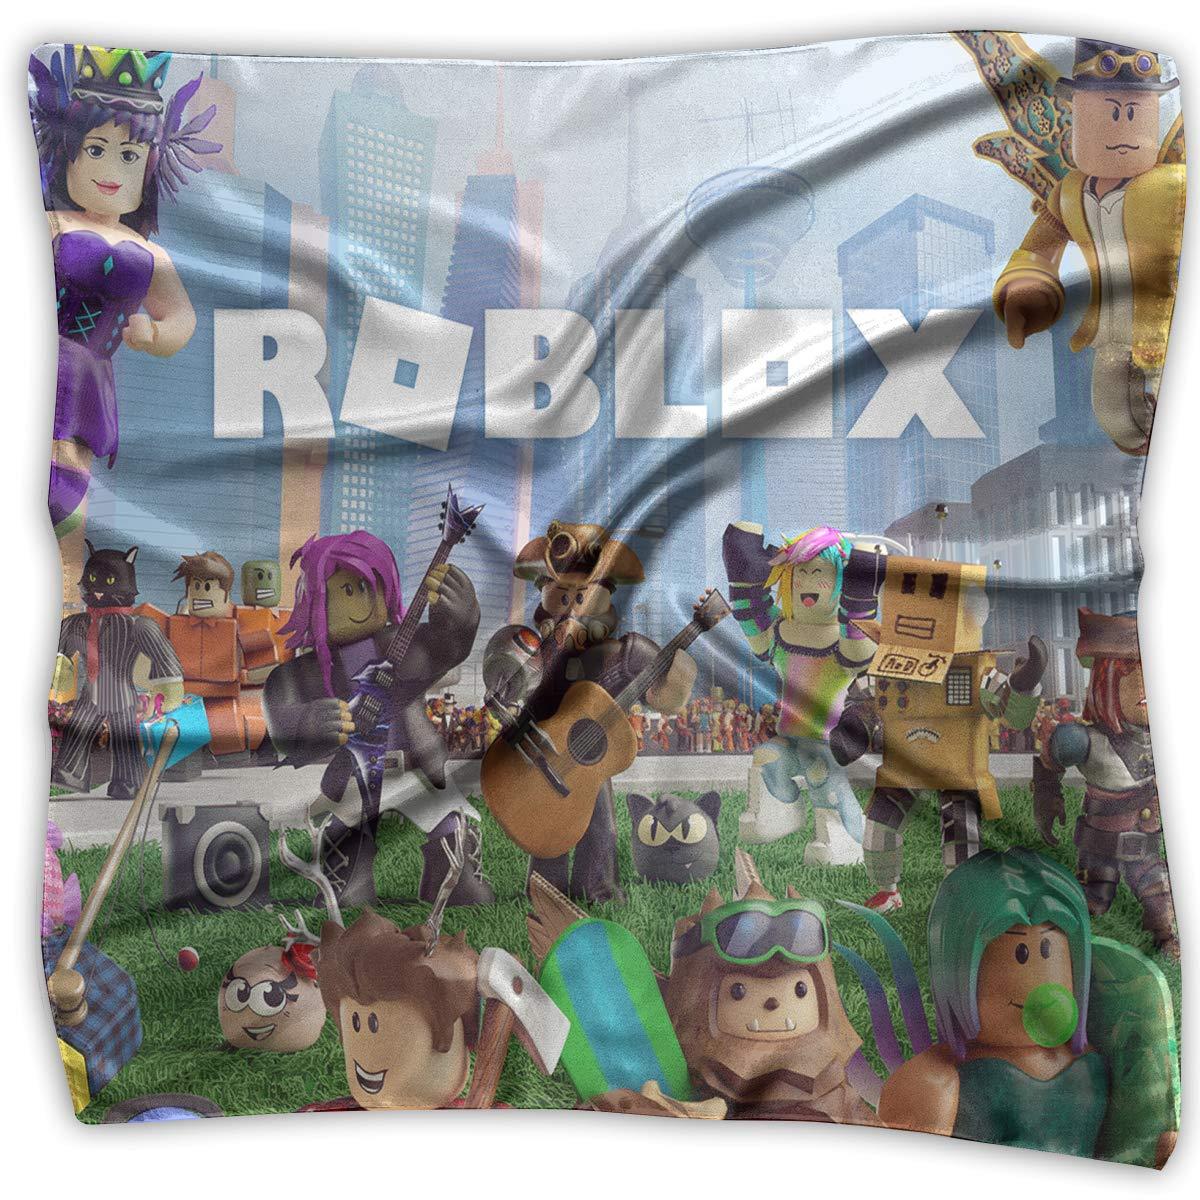 Amazoncom Roblox Feature Neck Scarf Square Silk Party - amazoncom roblox neck scarf square silk party